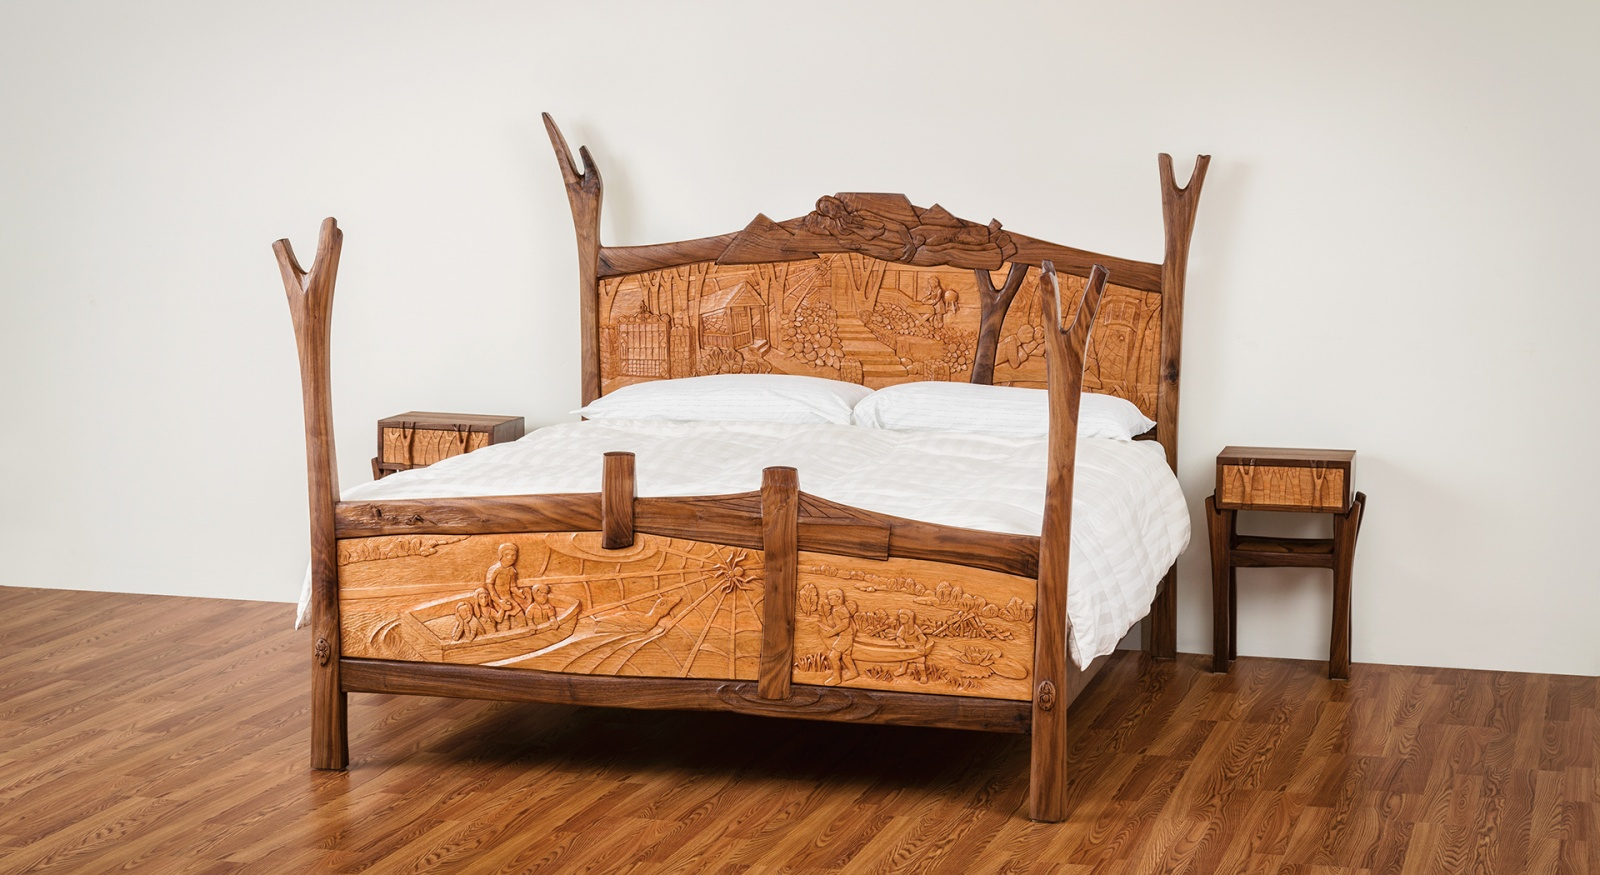 Custom, handmade bed created by Jeffrey Cooper